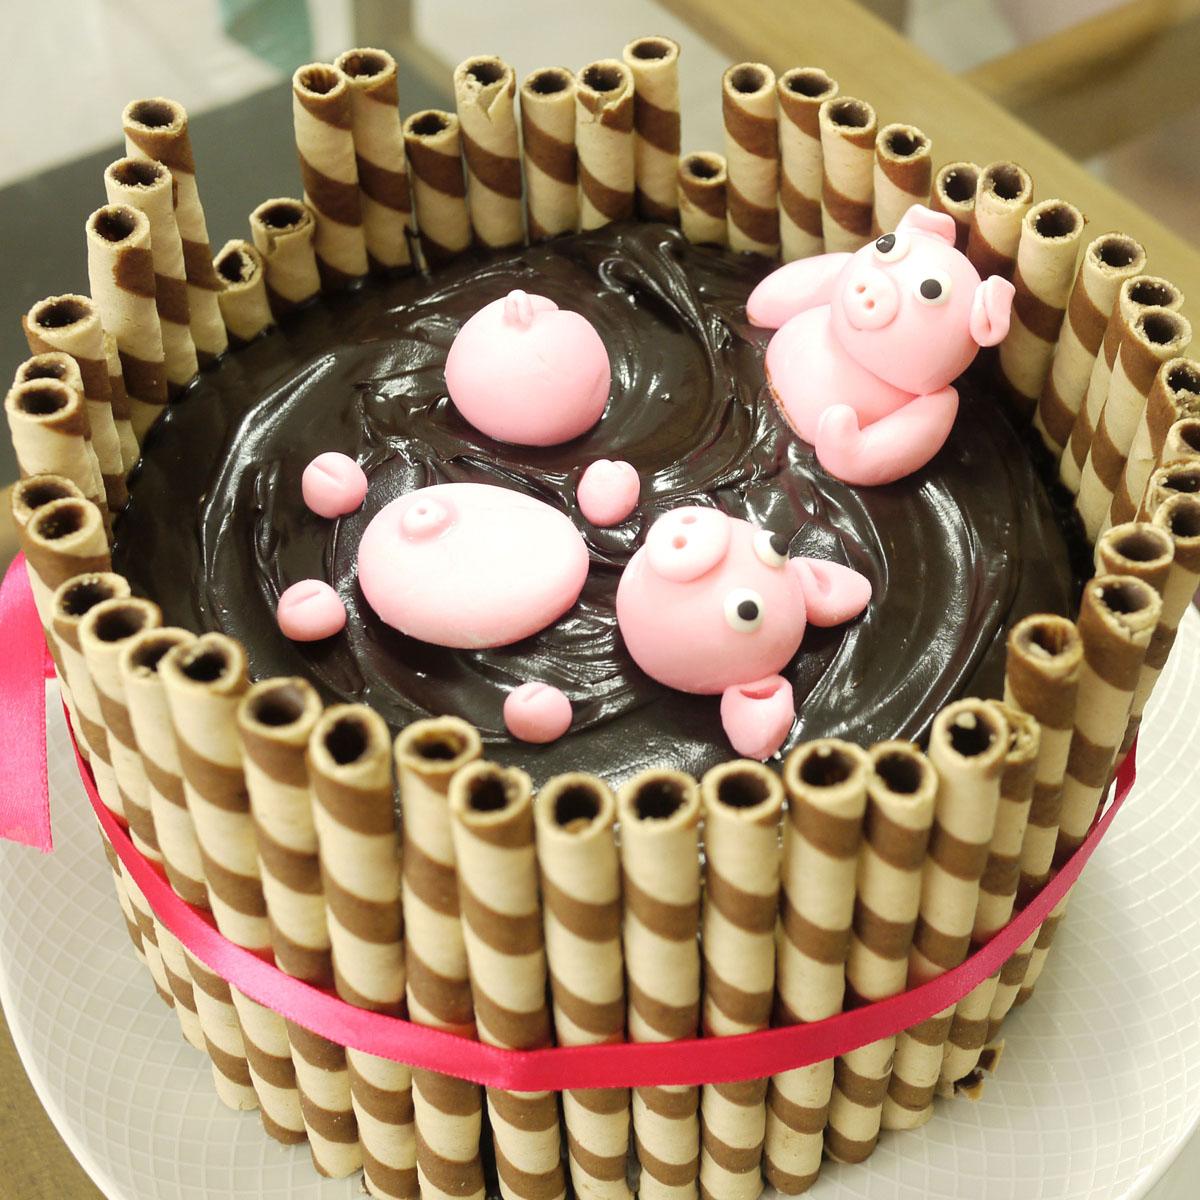 Mud Cake with Pigs